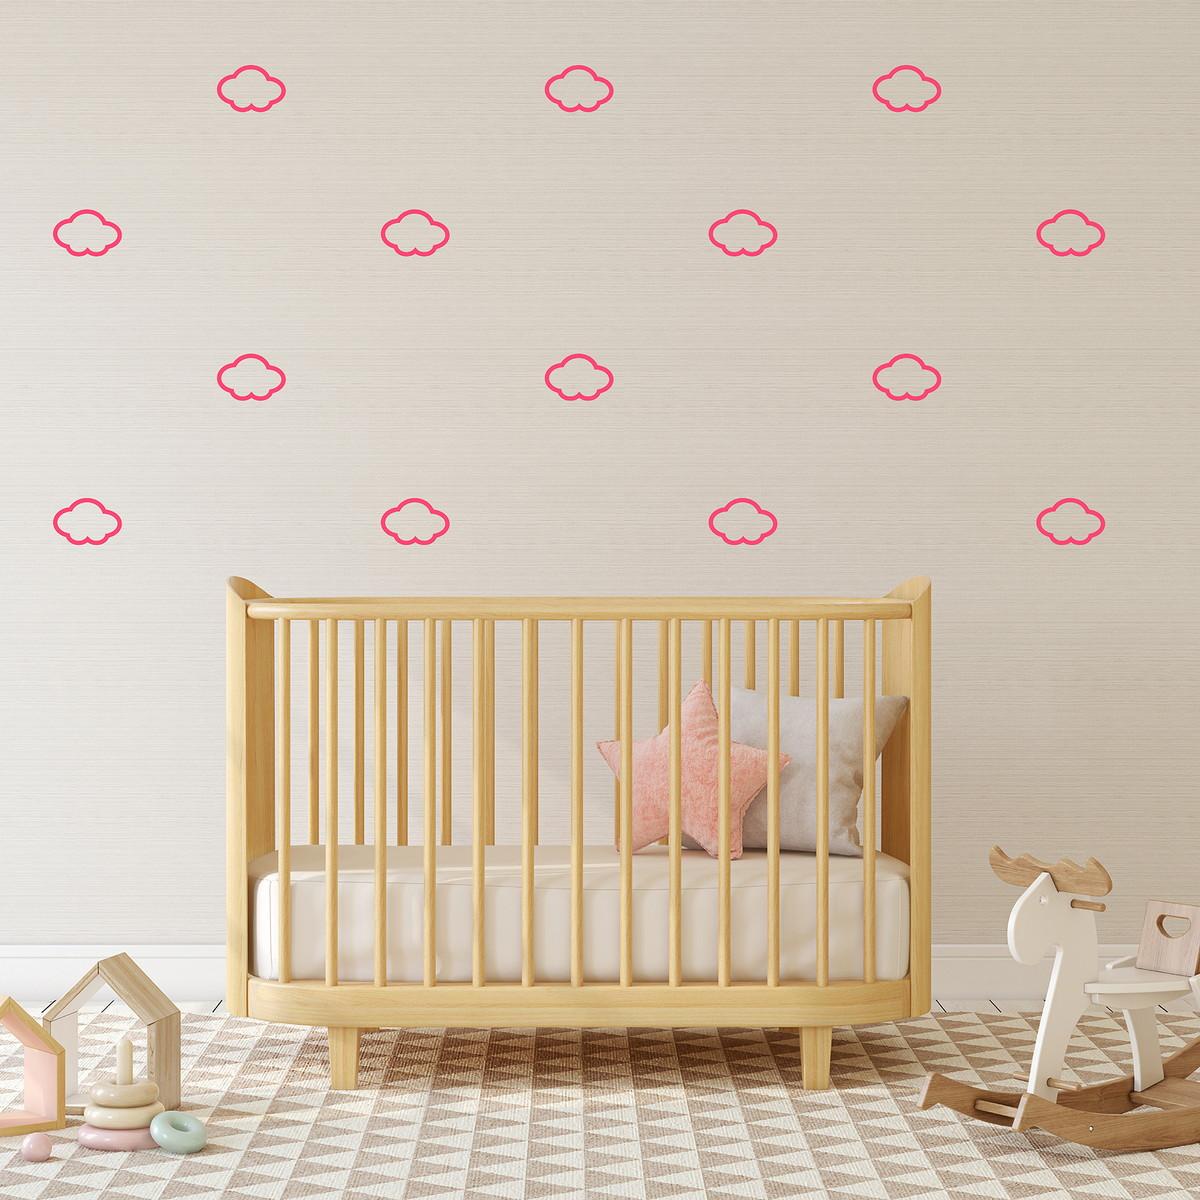 Zoom · Adesivos de parede Nuvens vazadas - 8 f64d9b9084f0d